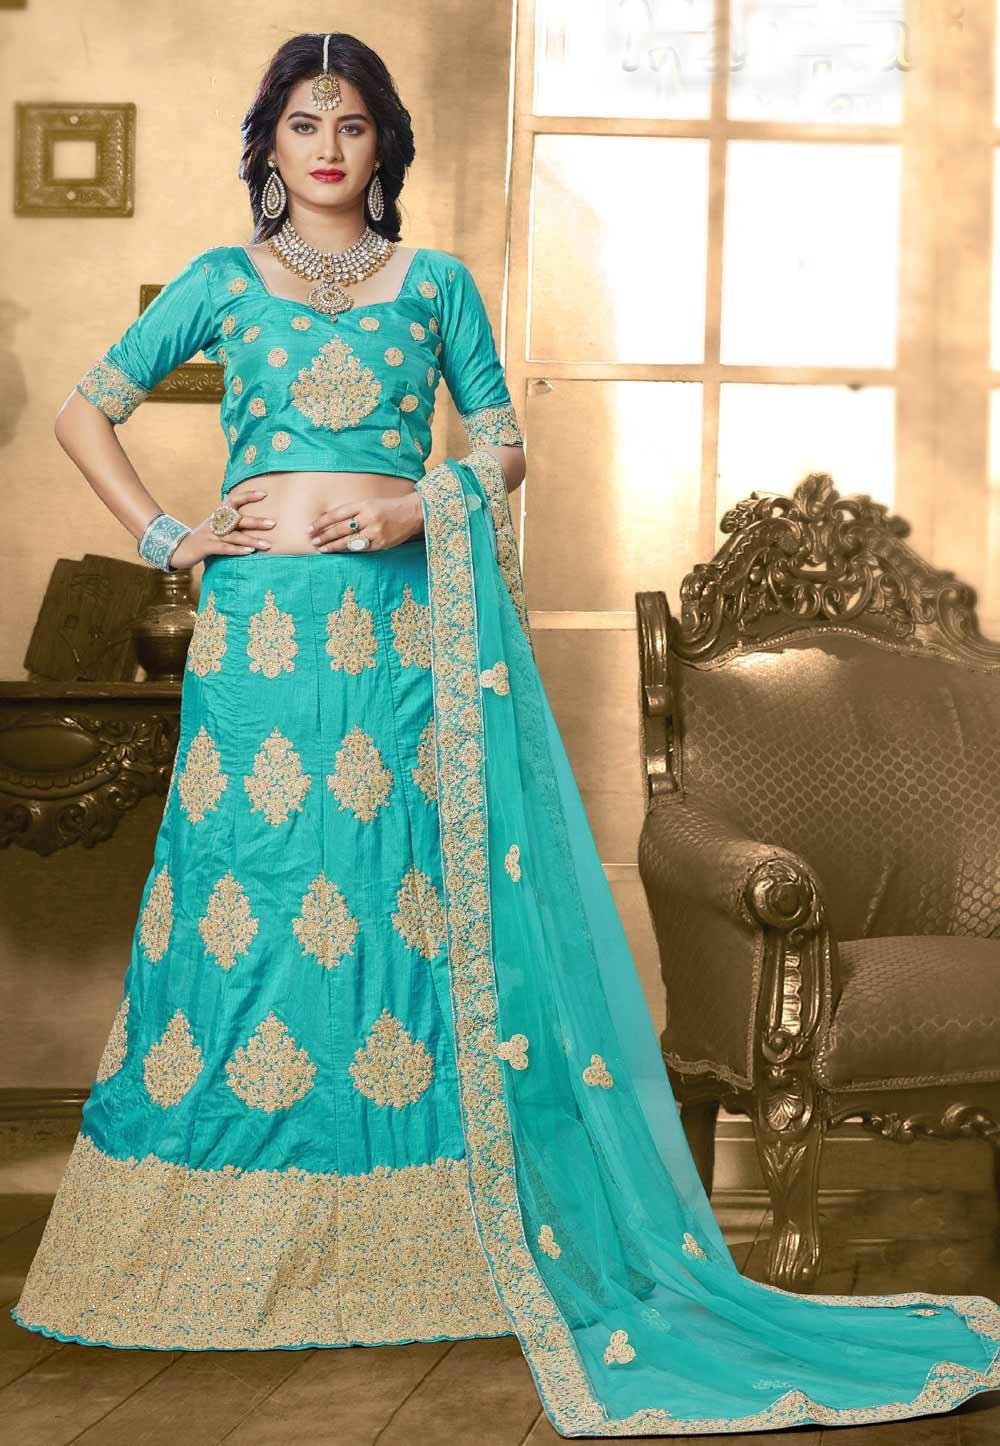 Attractive Lehenga Choli in Turquoise Color